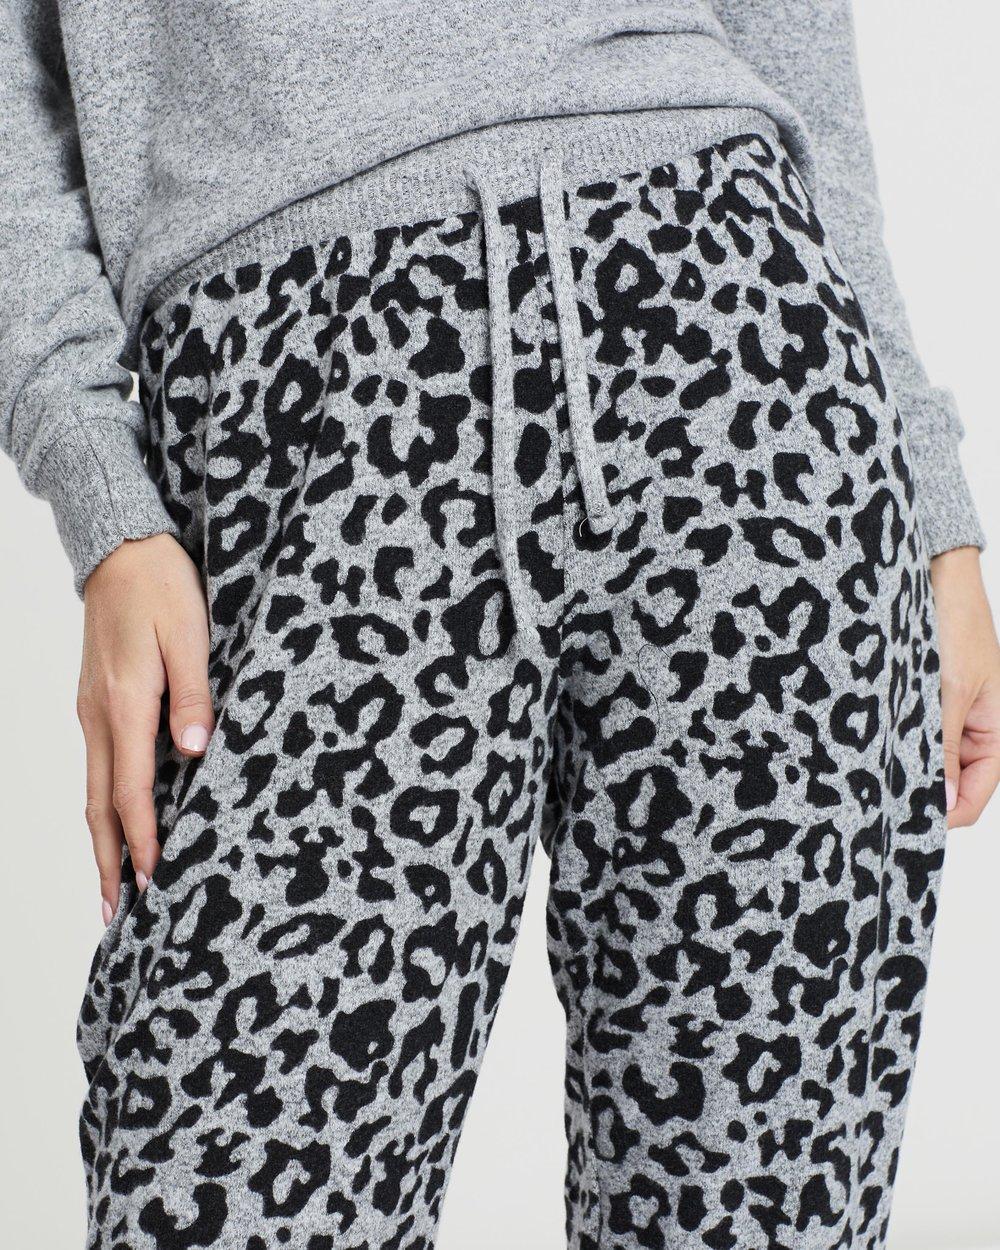 Leopard Print Jogger Pants by Dorothy Perkins Online  7142e5f72